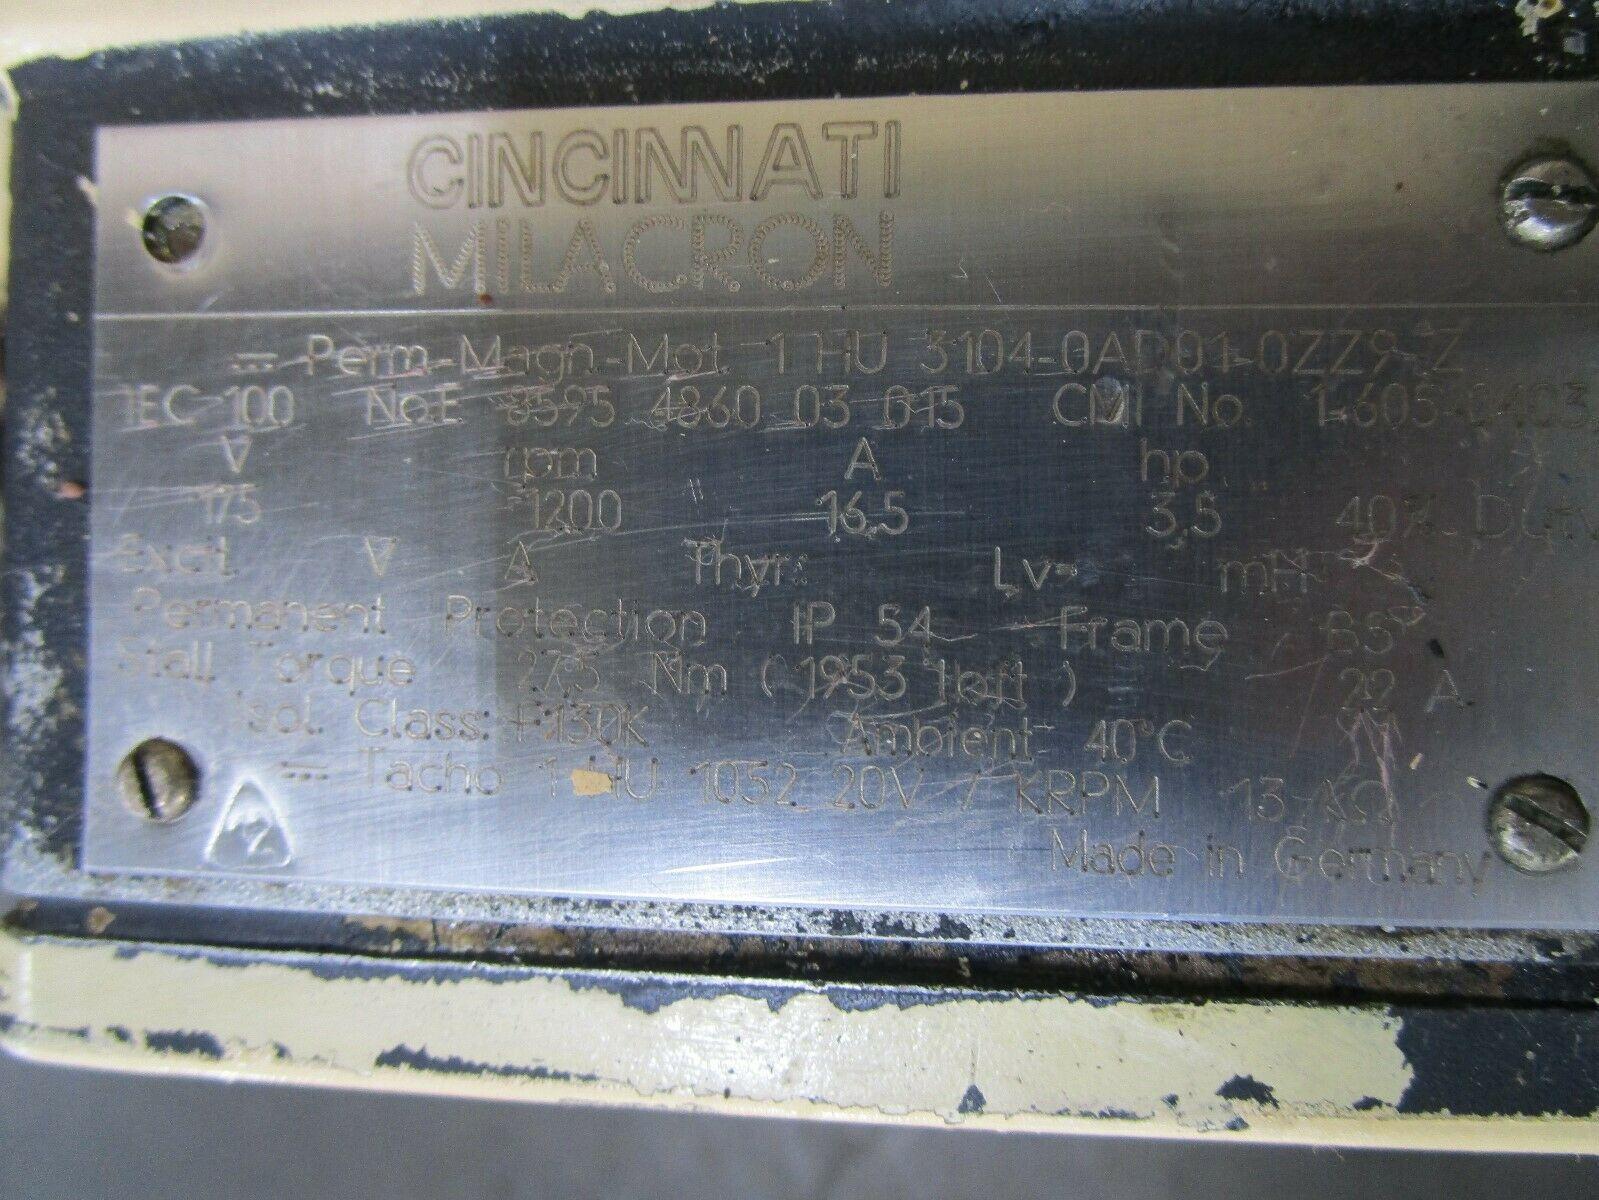 Siemens Servo Motor 1HU3104-0AD01-0ZZ9-Z Cincinnati Milacron Part# 1-605-0403